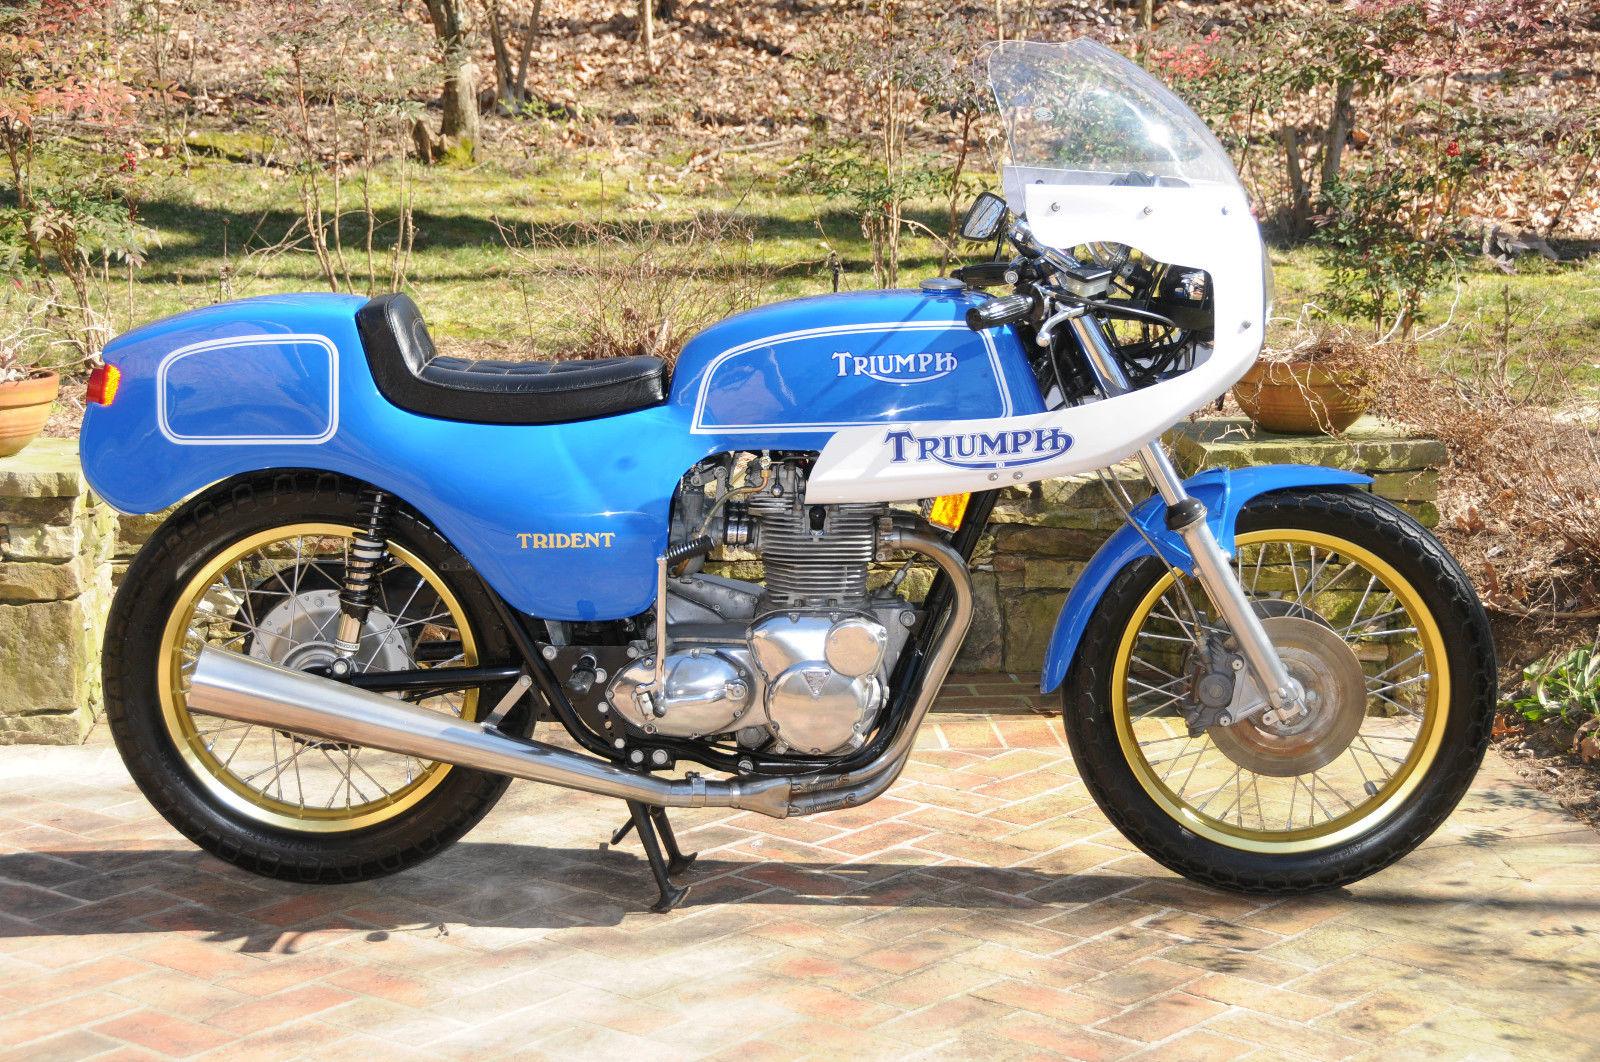 special body 1974 triumph trident cafe racer bike urious. Black Bedroom Furniture Sets. Home Design Ideas